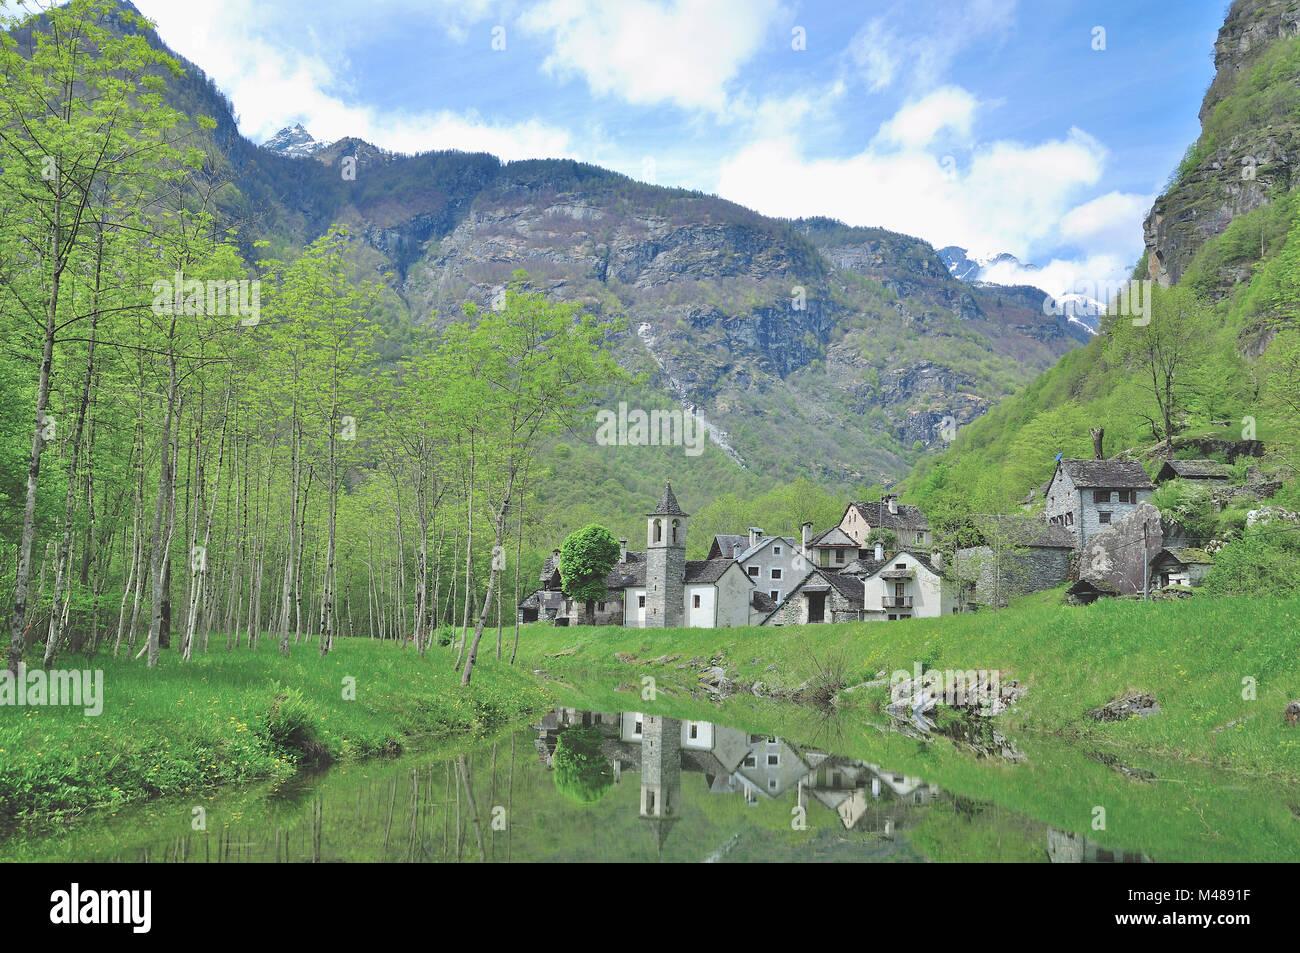 Village of Ritorto in Val Bavona,Ticino Canton,Switzerland - Stock Image